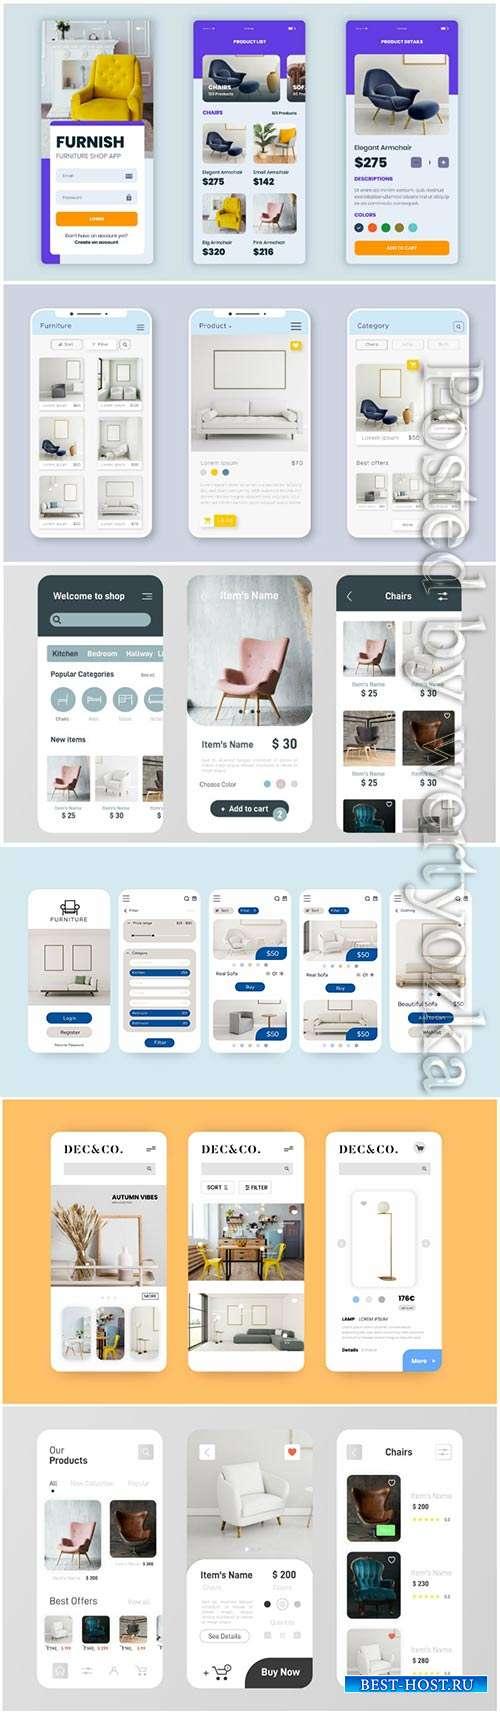 Furniture shopping app pack